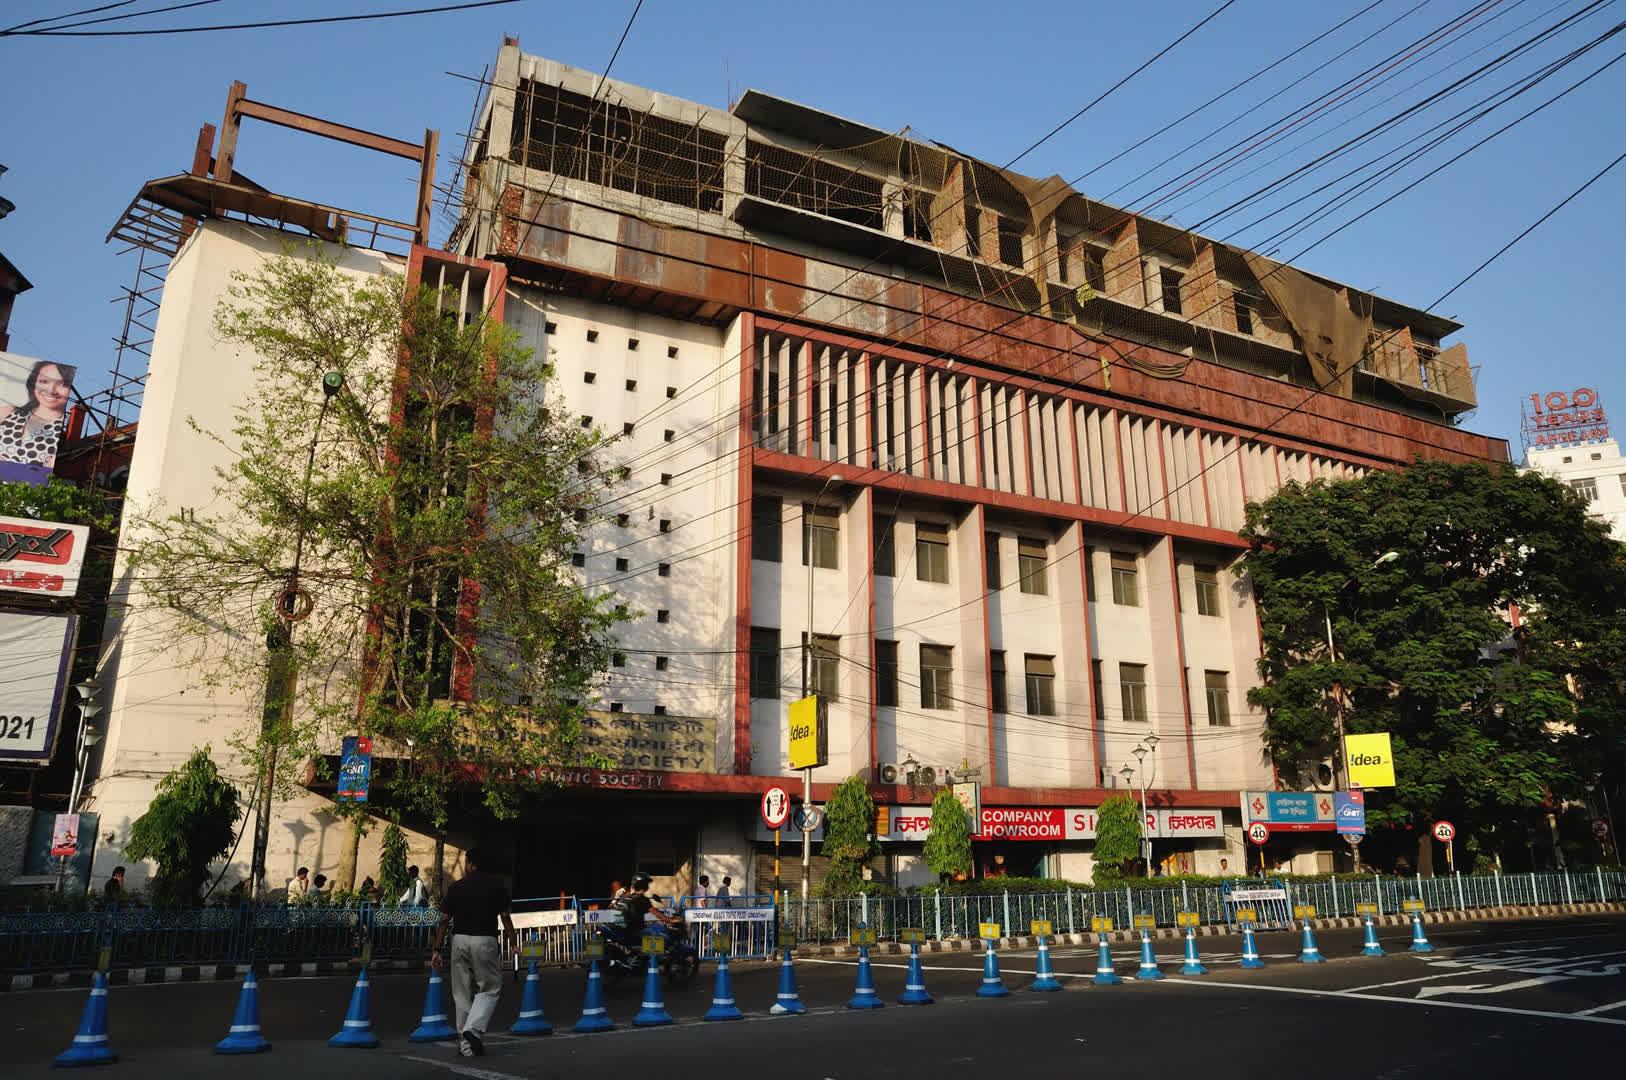 Asiatic Society